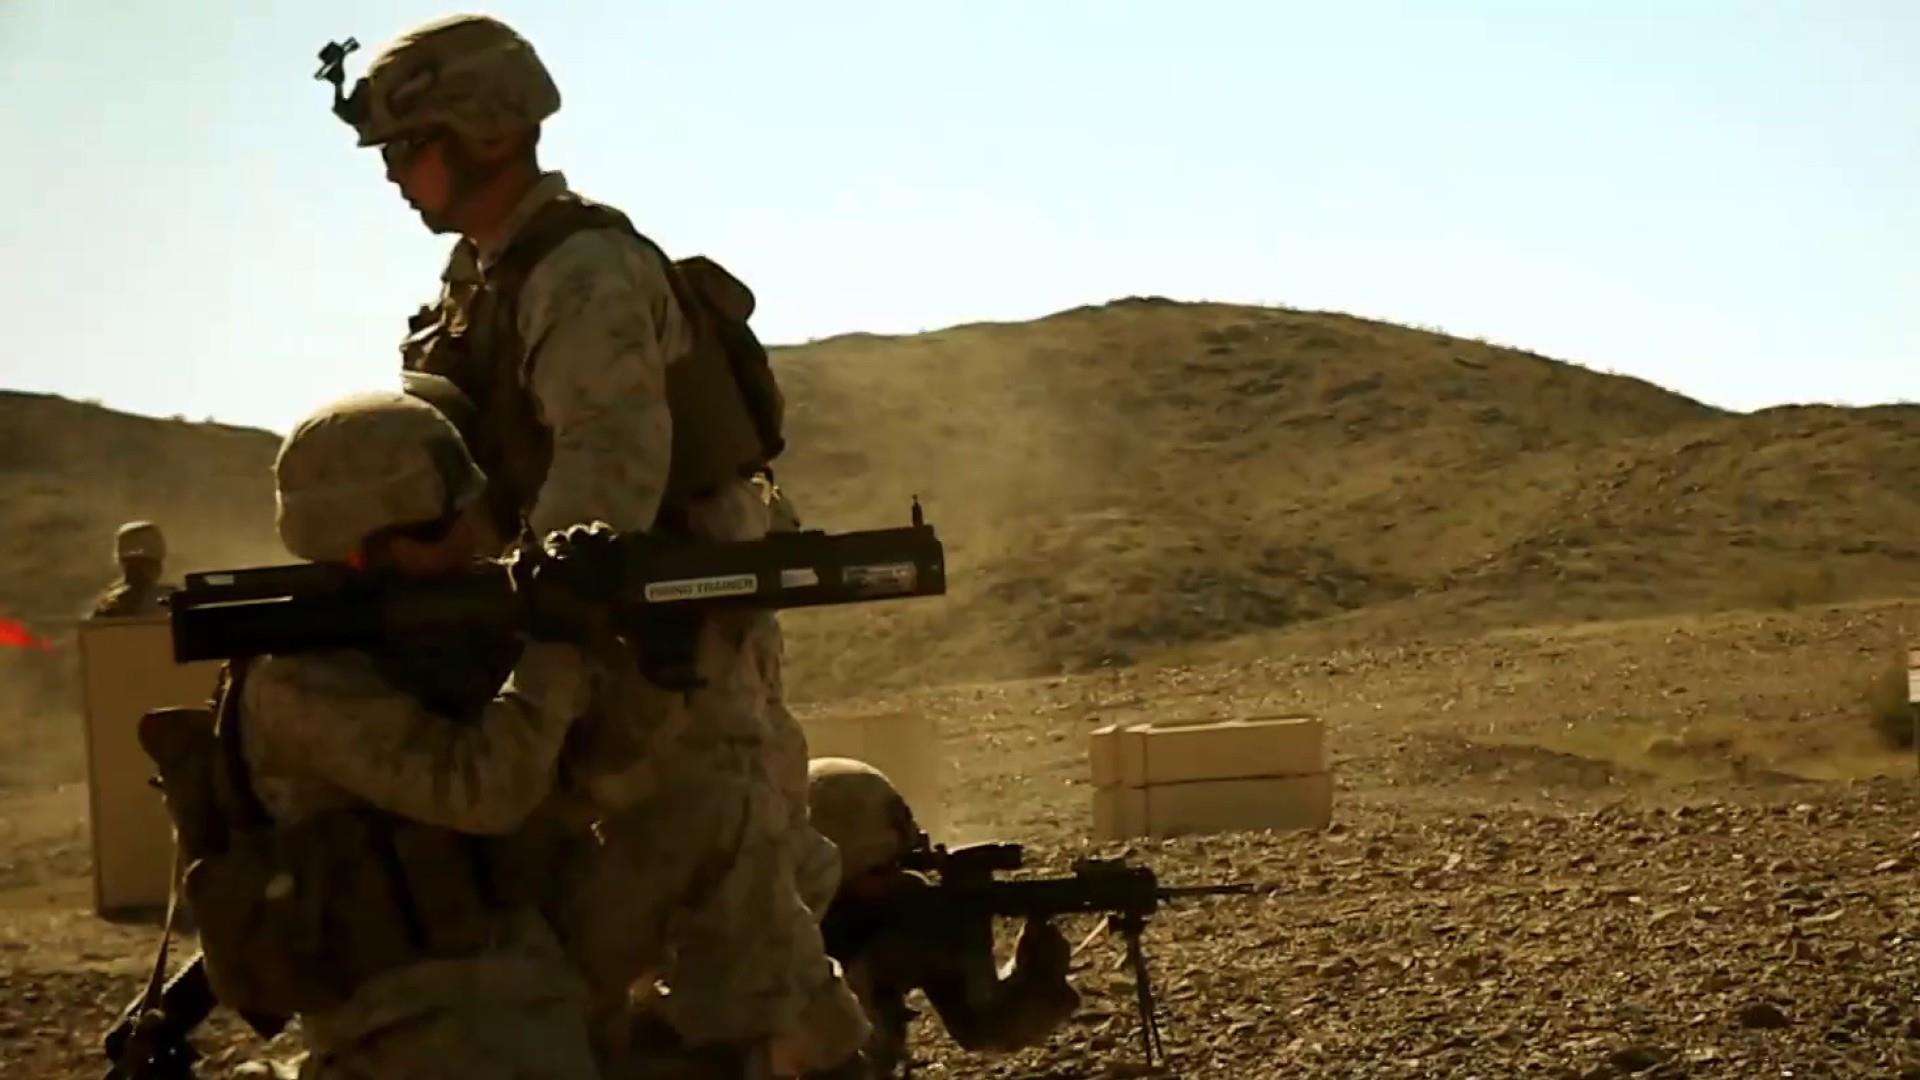 Supreme Court allows Trump administration to enforce transgender military ban